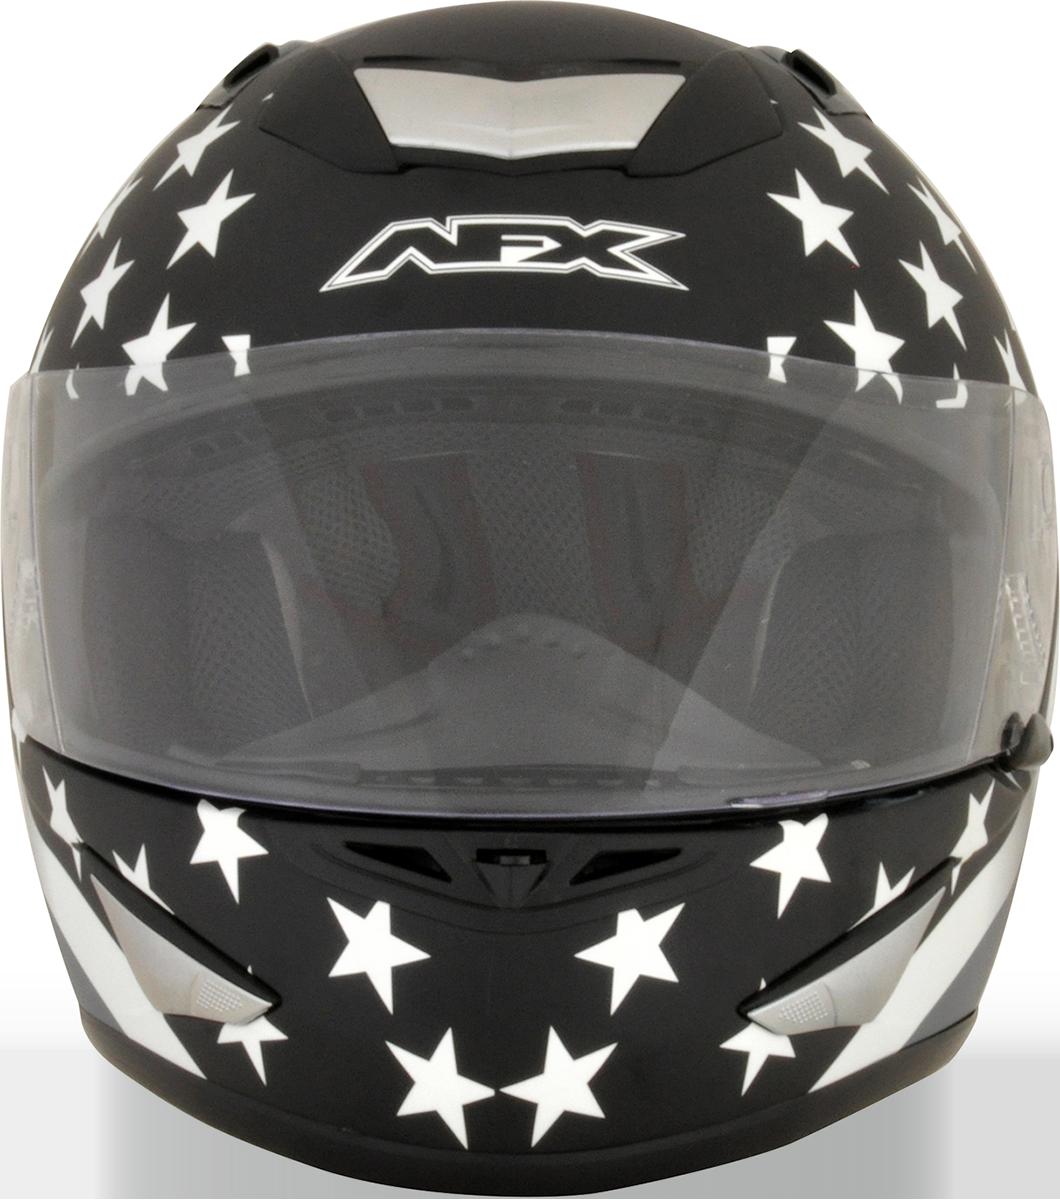 AFX Black Full Face Stealth American Motorcycle Riding Street Racing Helmet